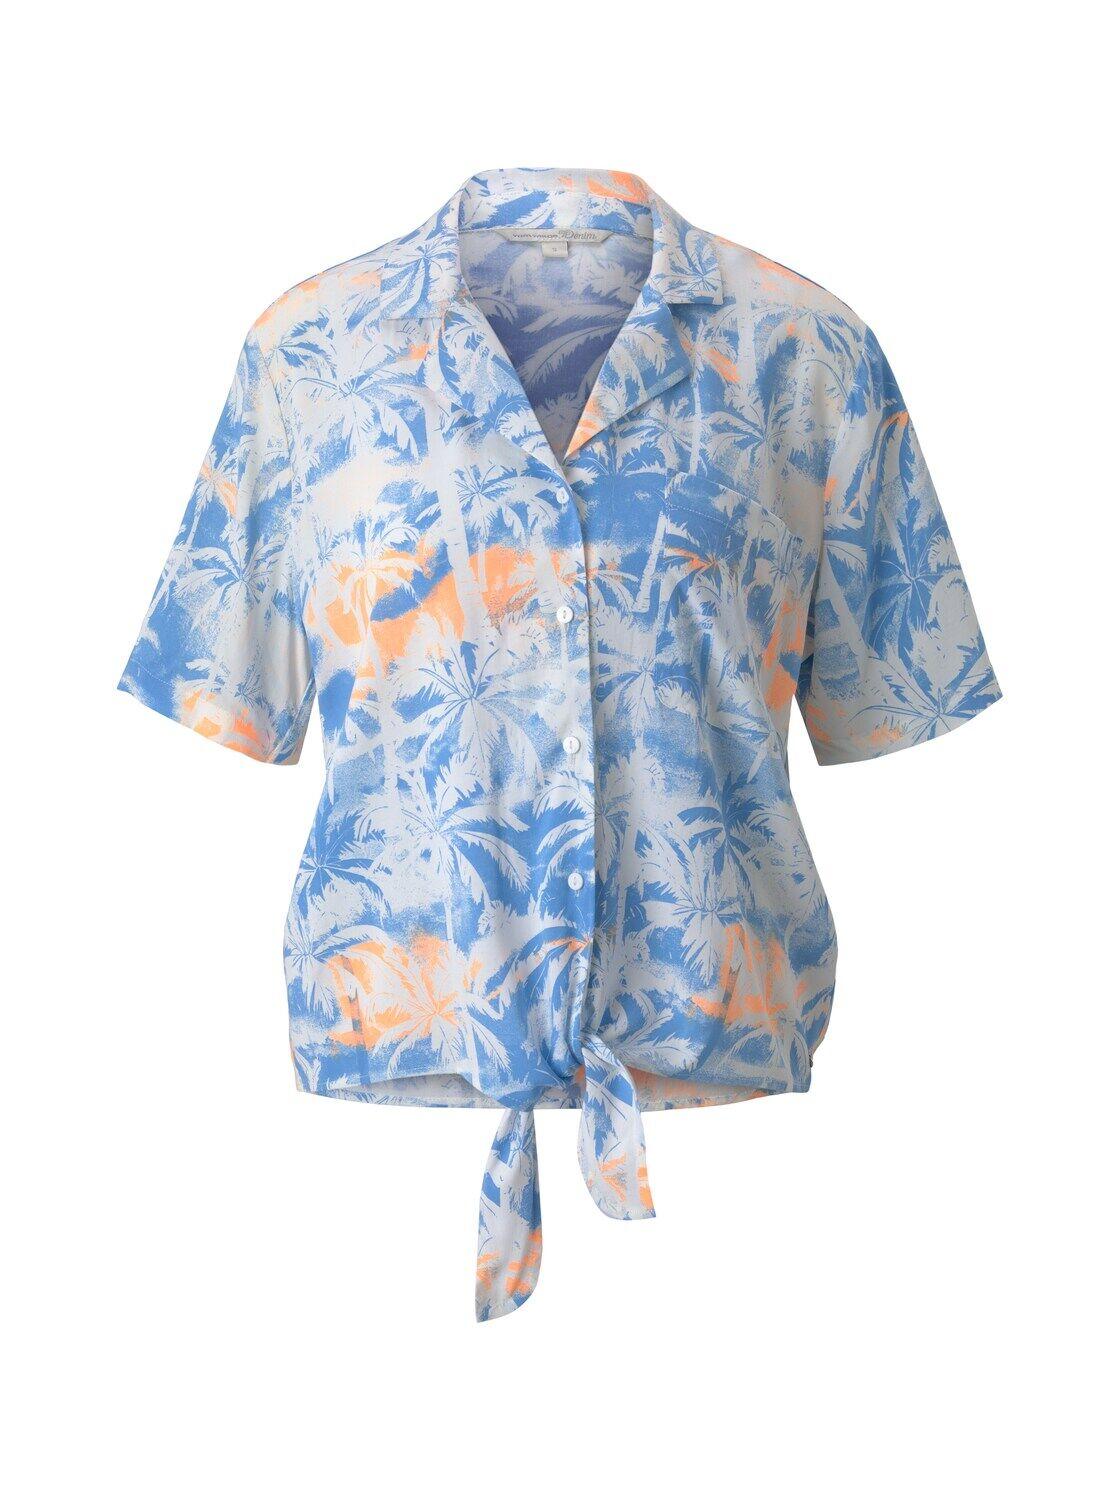 TOM TAILOR DENIM Damen Hawaii-He...